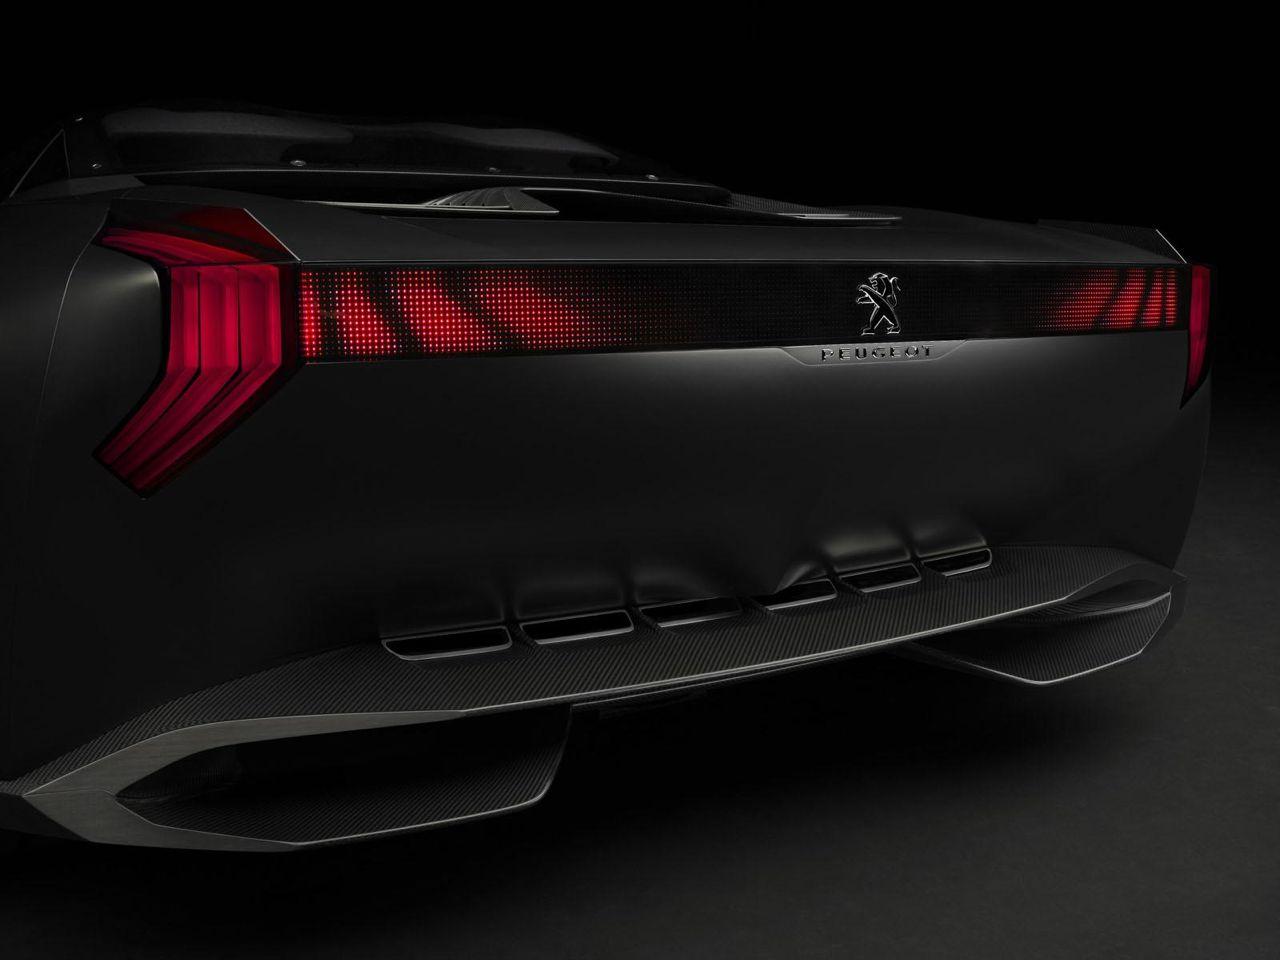 Peugeot Onyx Concept - Salone di Parigi 2012